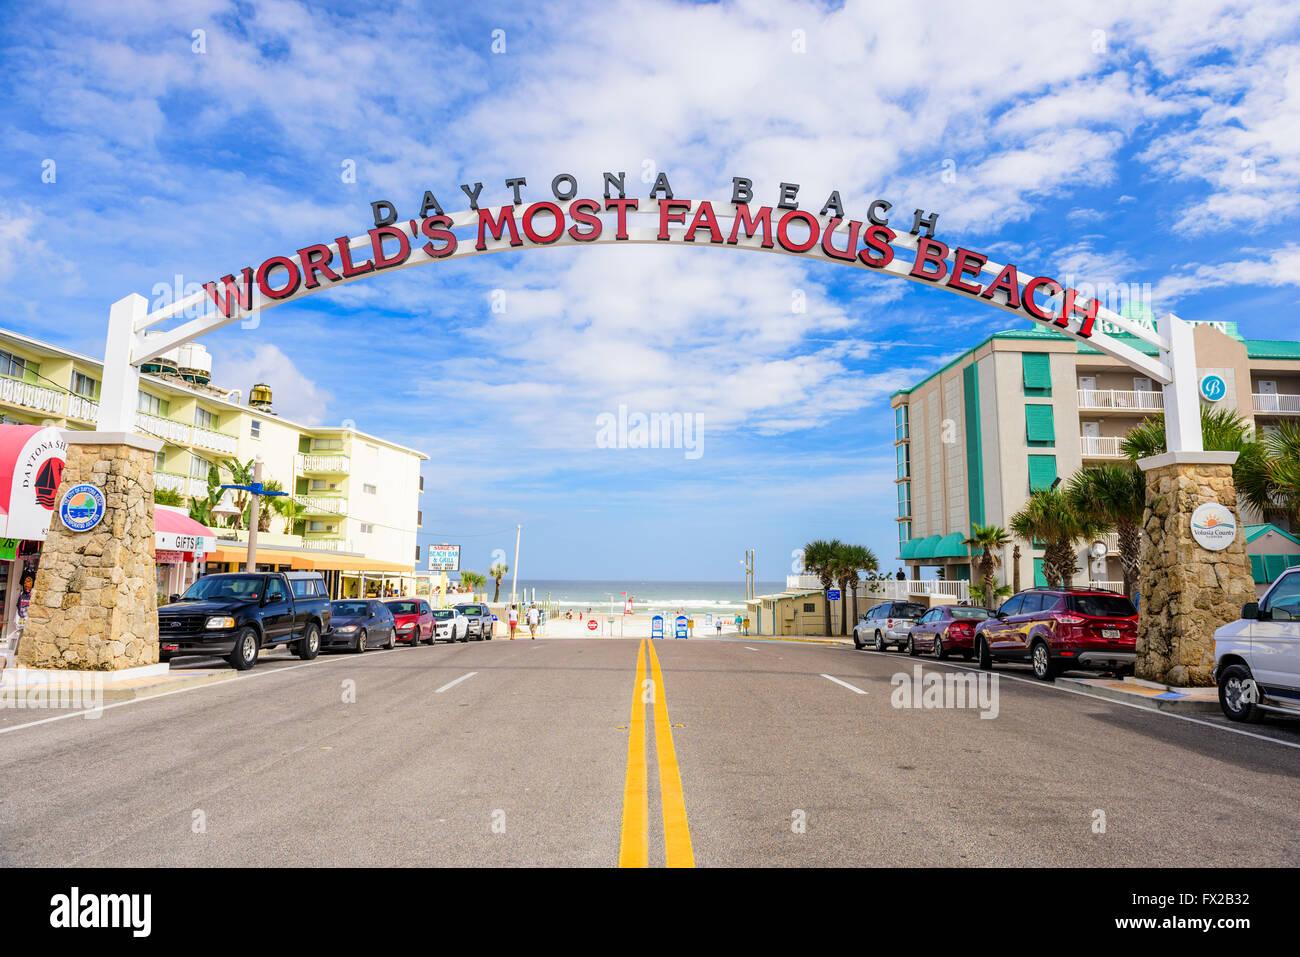 Daytona Beach Hotels On The Ocean